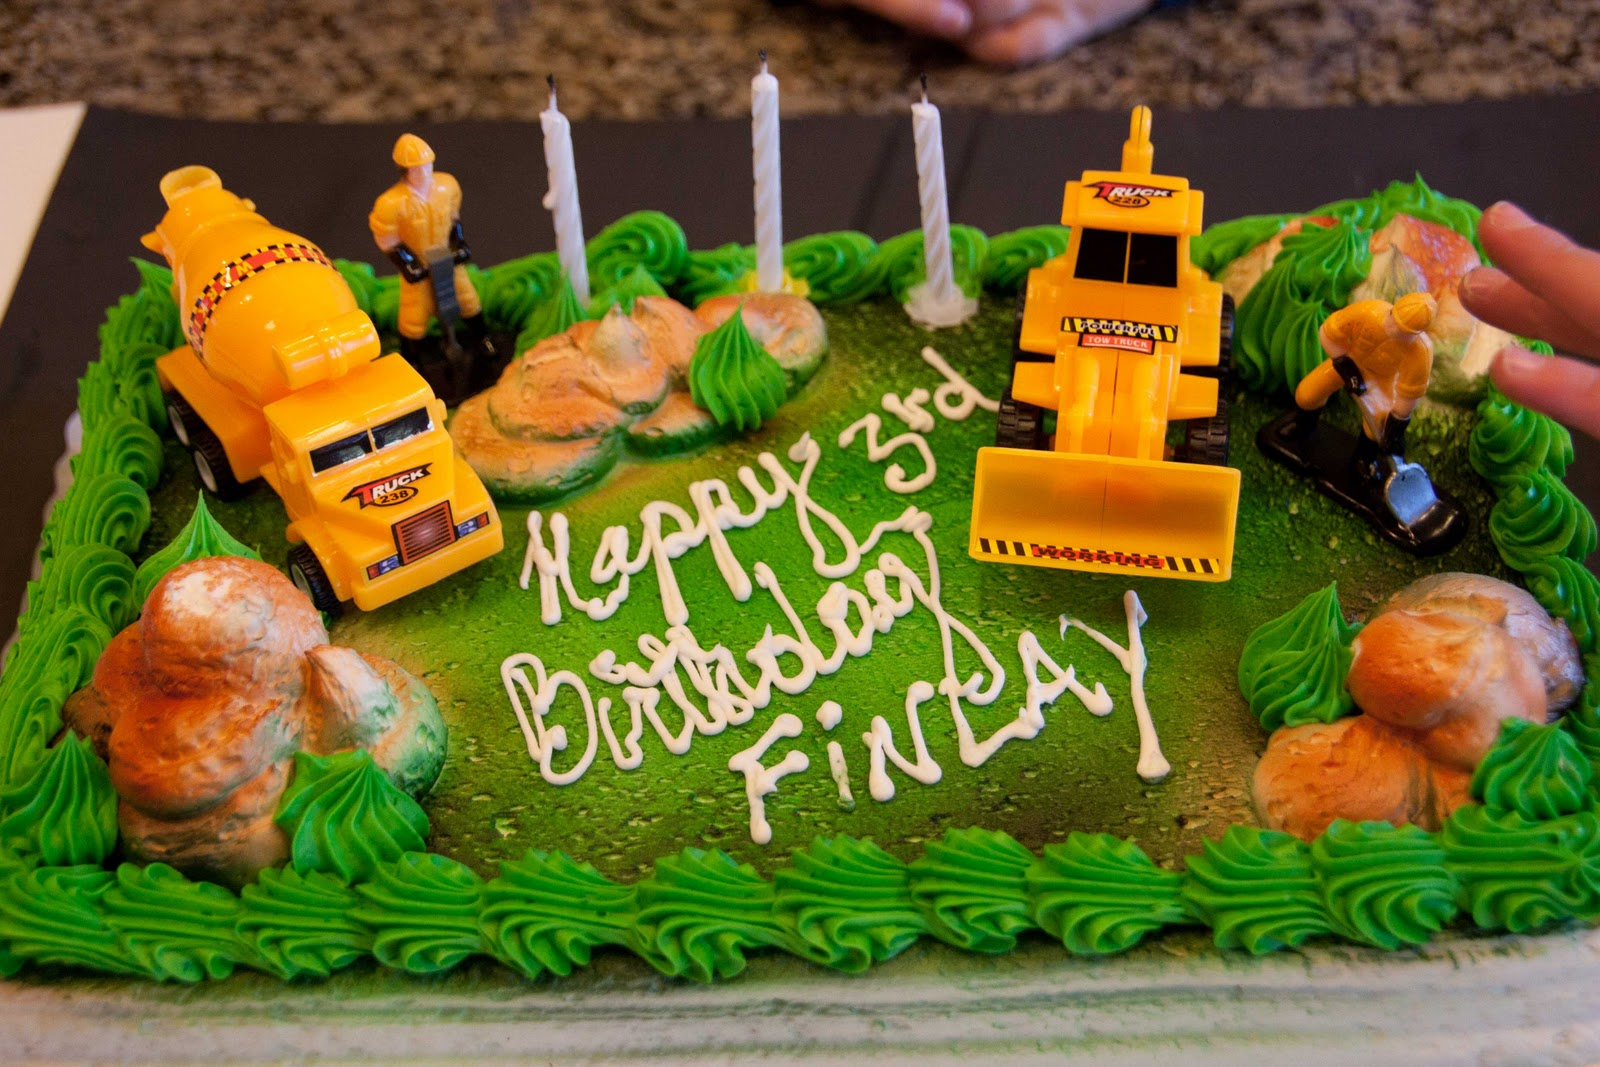 Little Mermaid Birthday Cake Safeway Image Inspiration of Cake